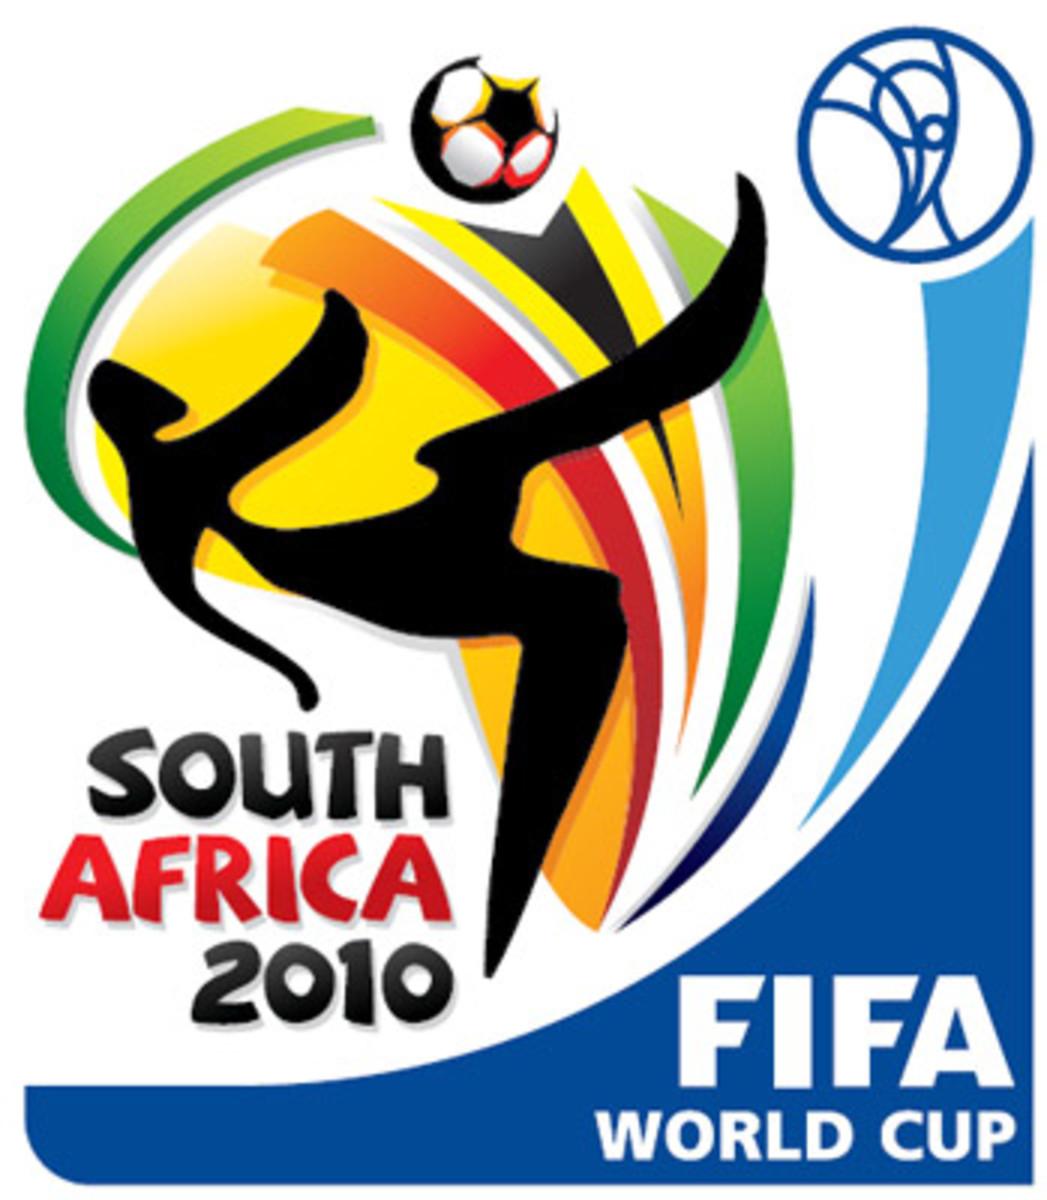 Image: Fifa